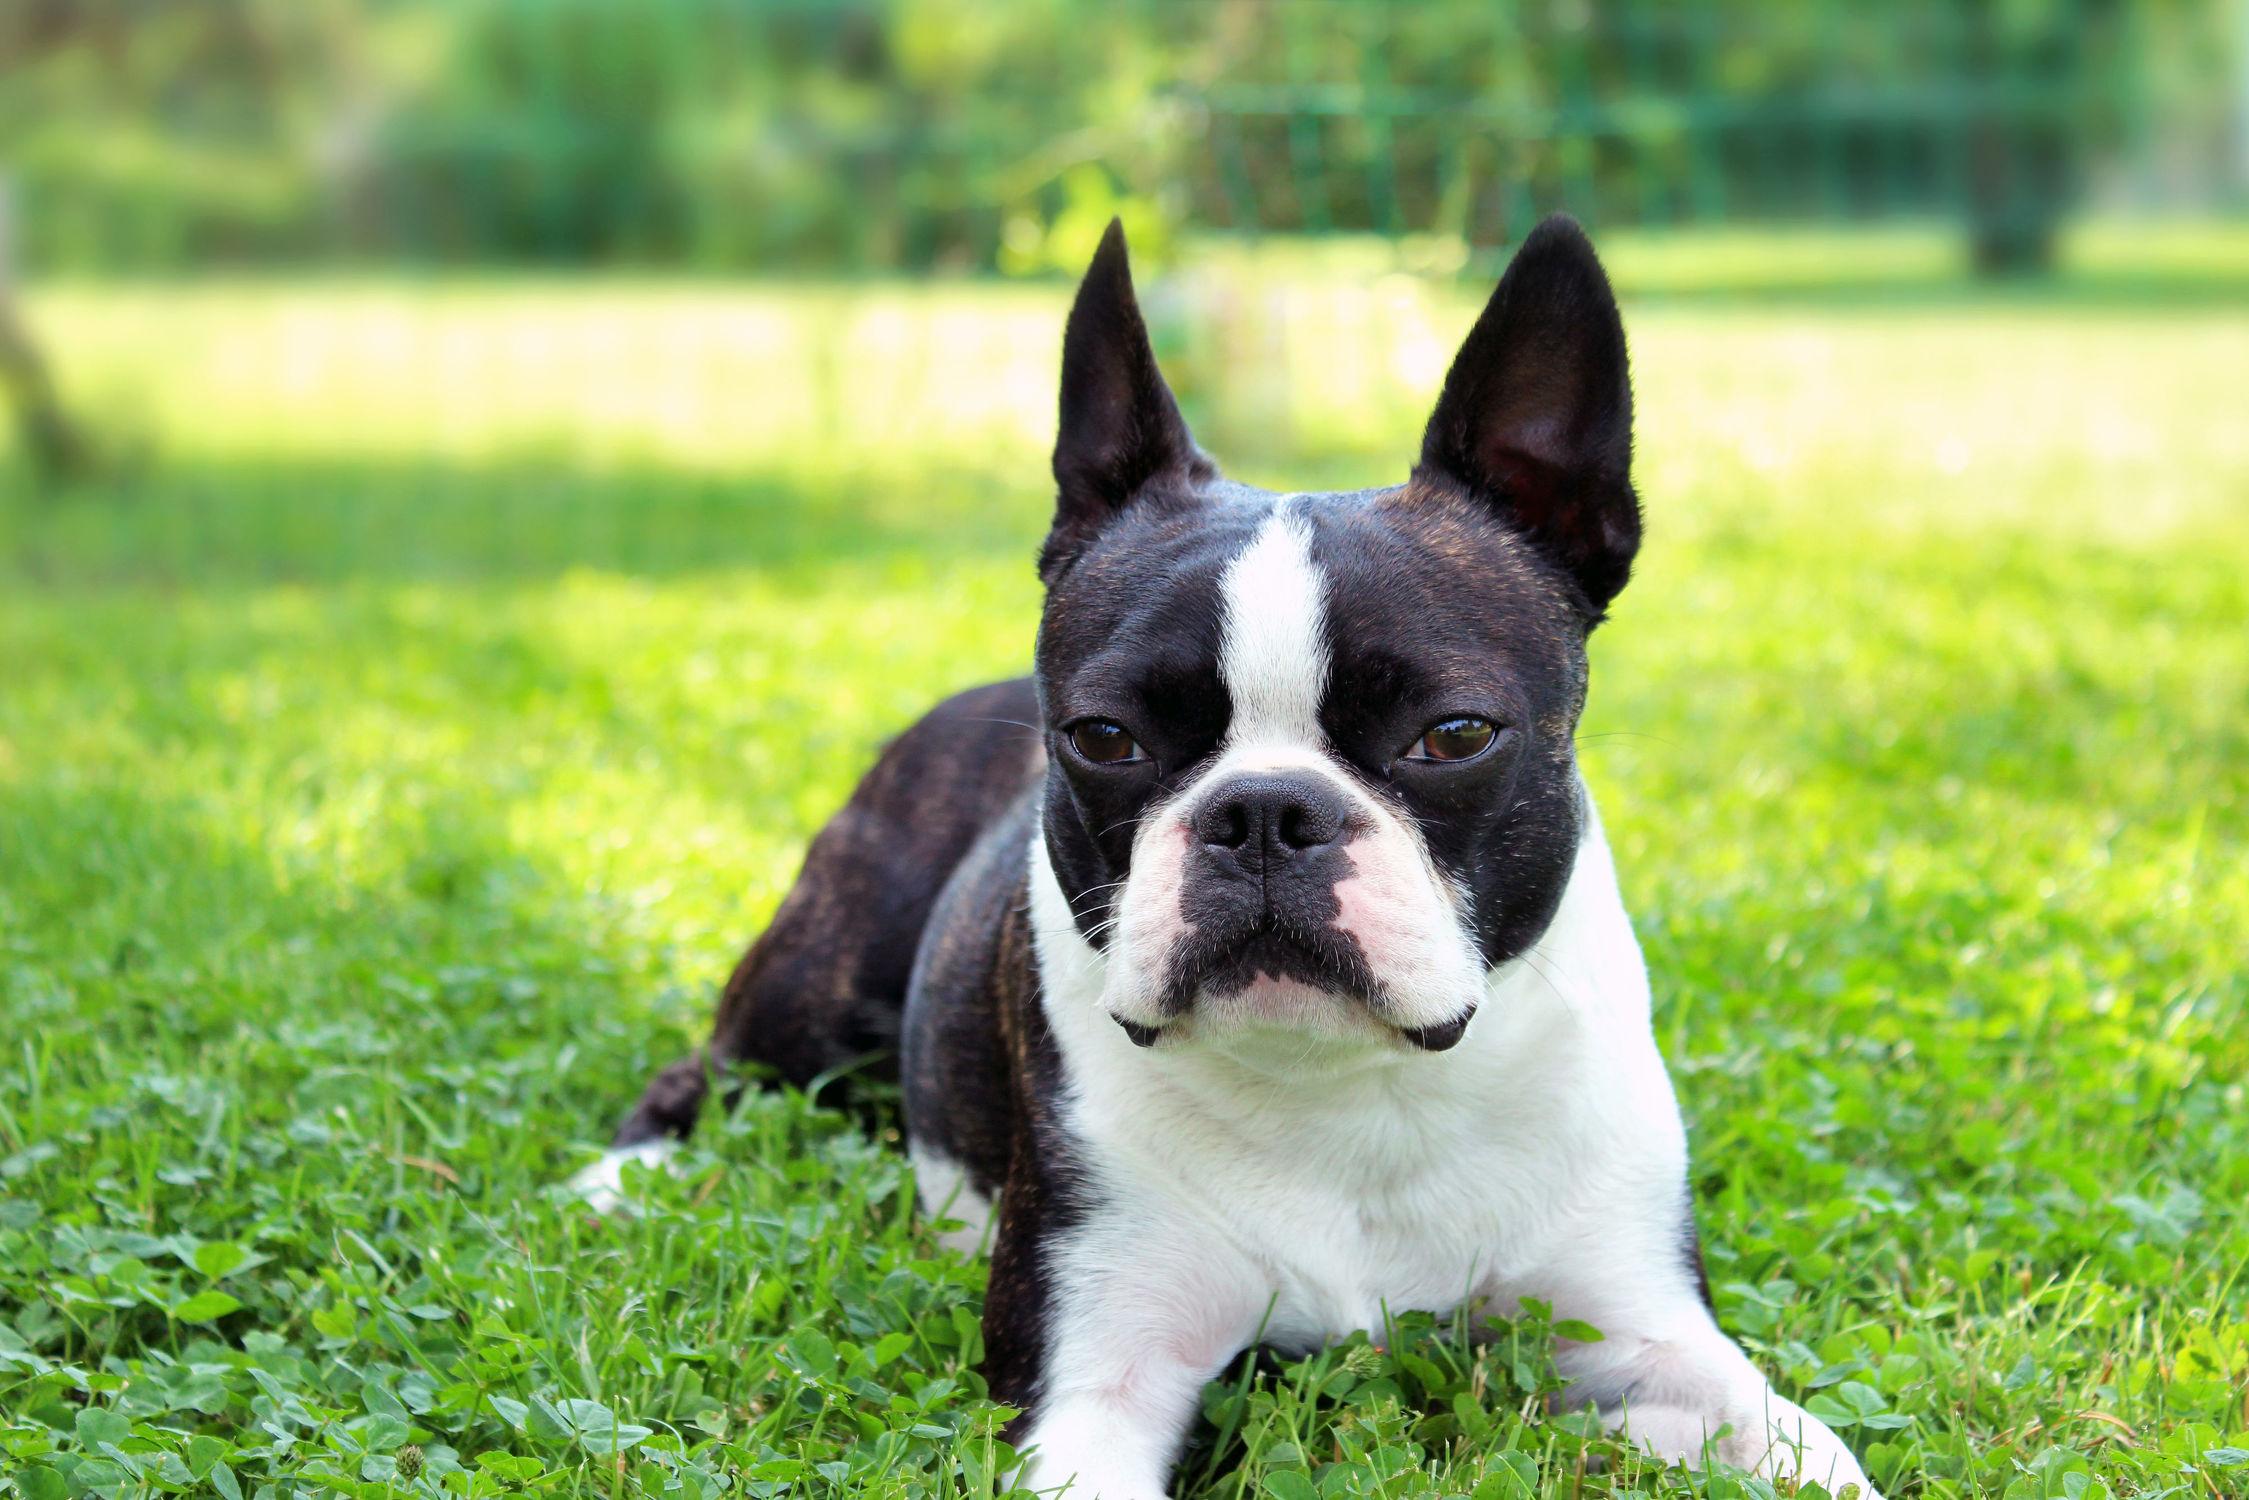 Bild mit Hunde, Tier, Hund, Dog, Bulldogge, Boston Terrier, Bosti, Kleine doggenartige Hunde, Familienhund, Hundebild, Haustier